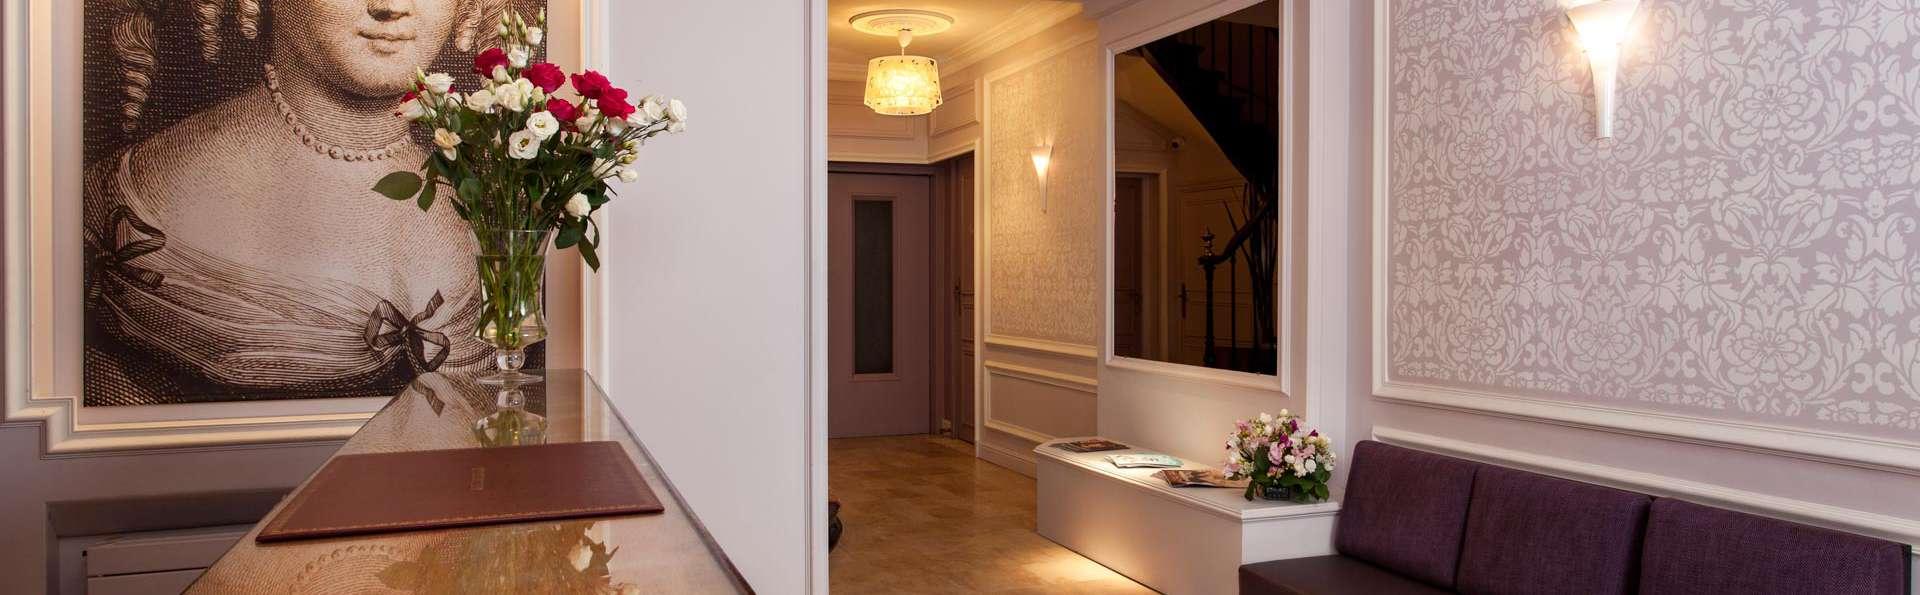 Hôtel de Sévigné - EDIT_LOBBY_01.jpg